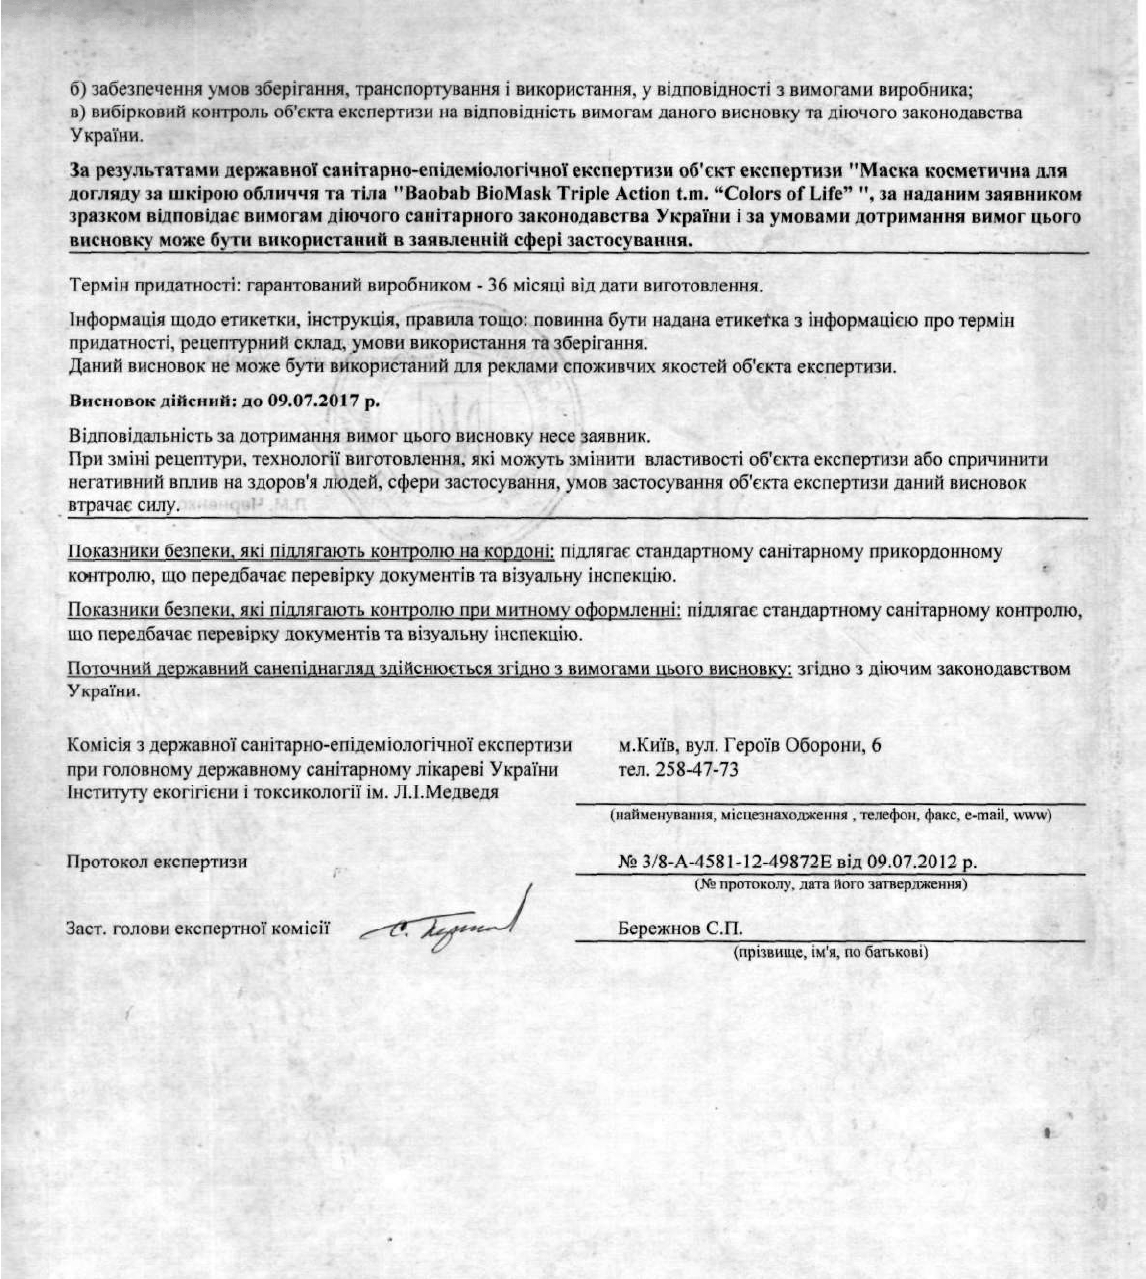 Заключение МОЗ Украины на соответствии Baobab Biomask компании Colors of Life требованиям (стр 2)